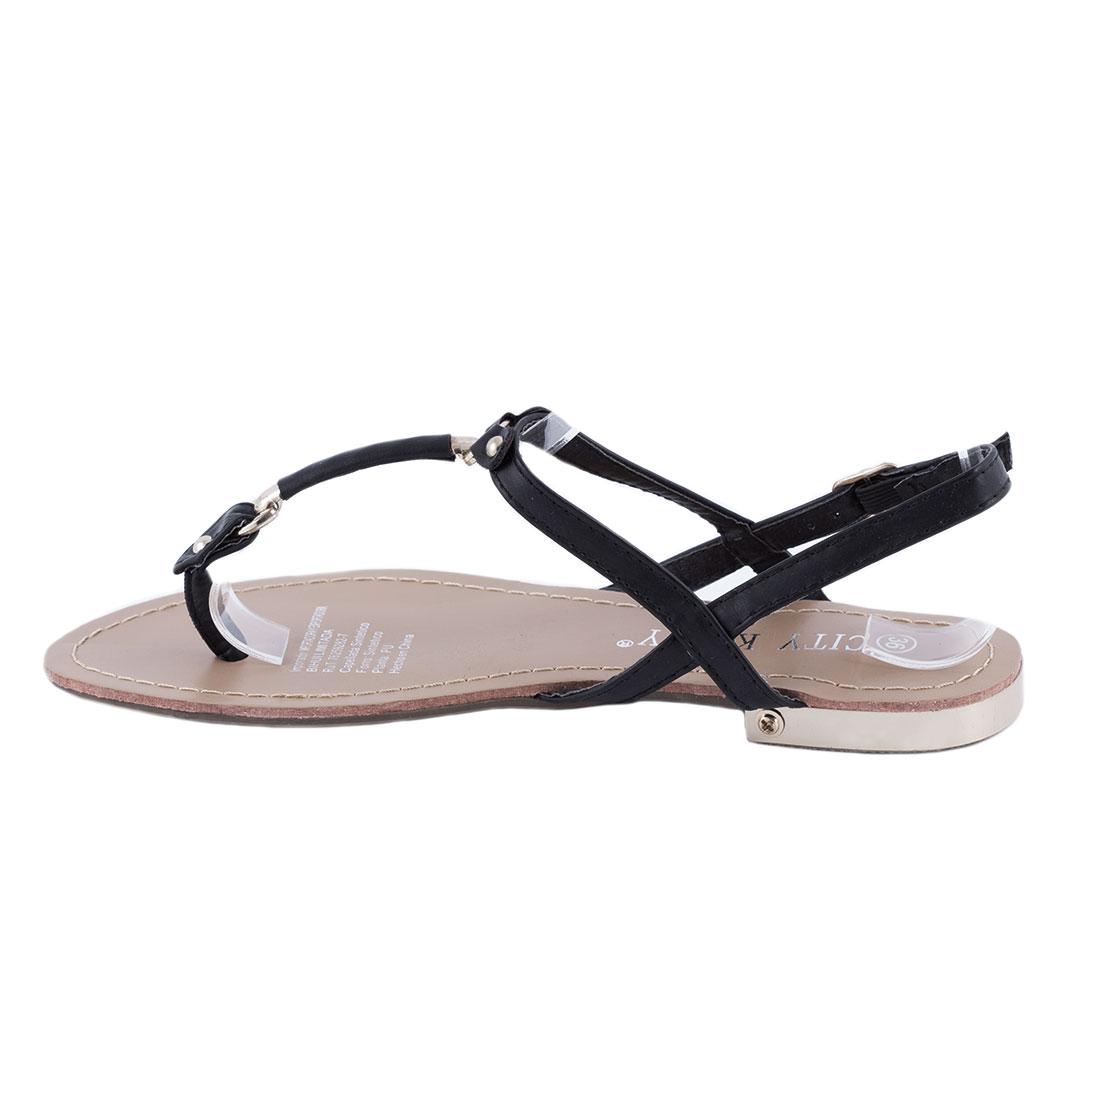 Sandale de dama cu barete YJ746-1N